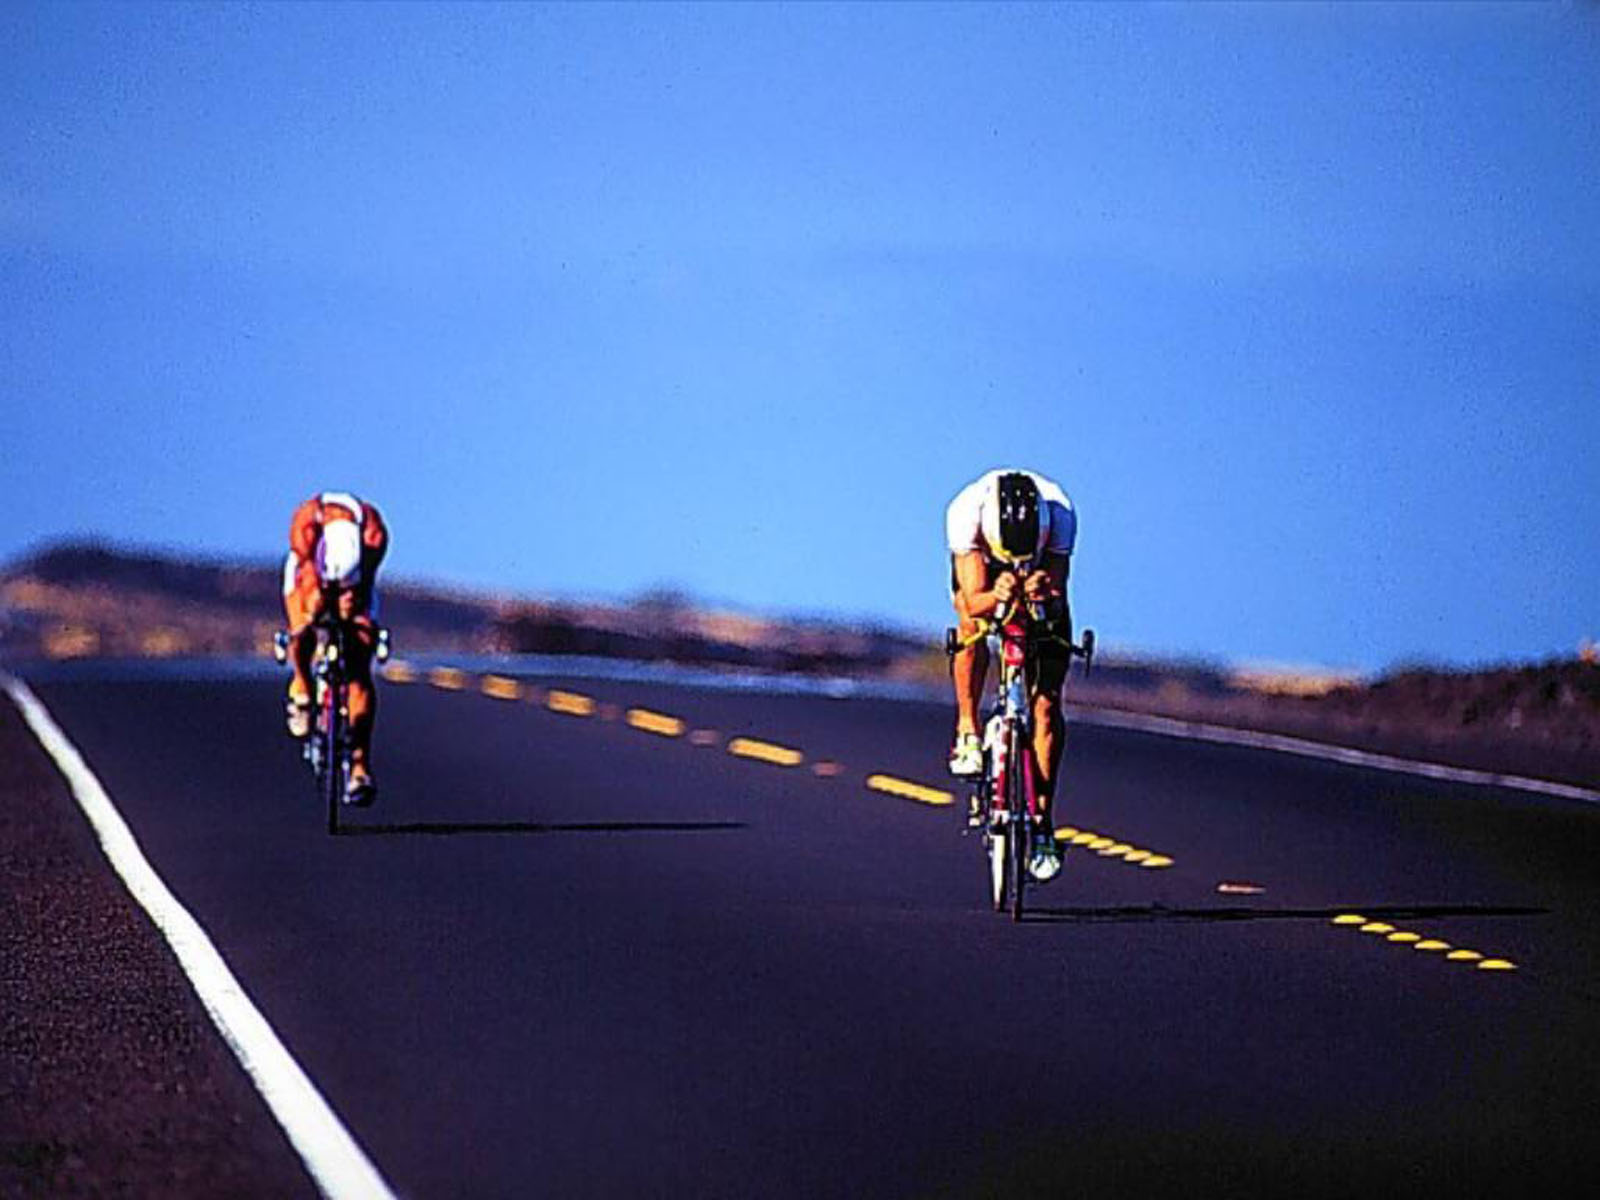 49] Sport Backgrounds Wallpapers for Desktop on WallpaperSafari 1600x1200